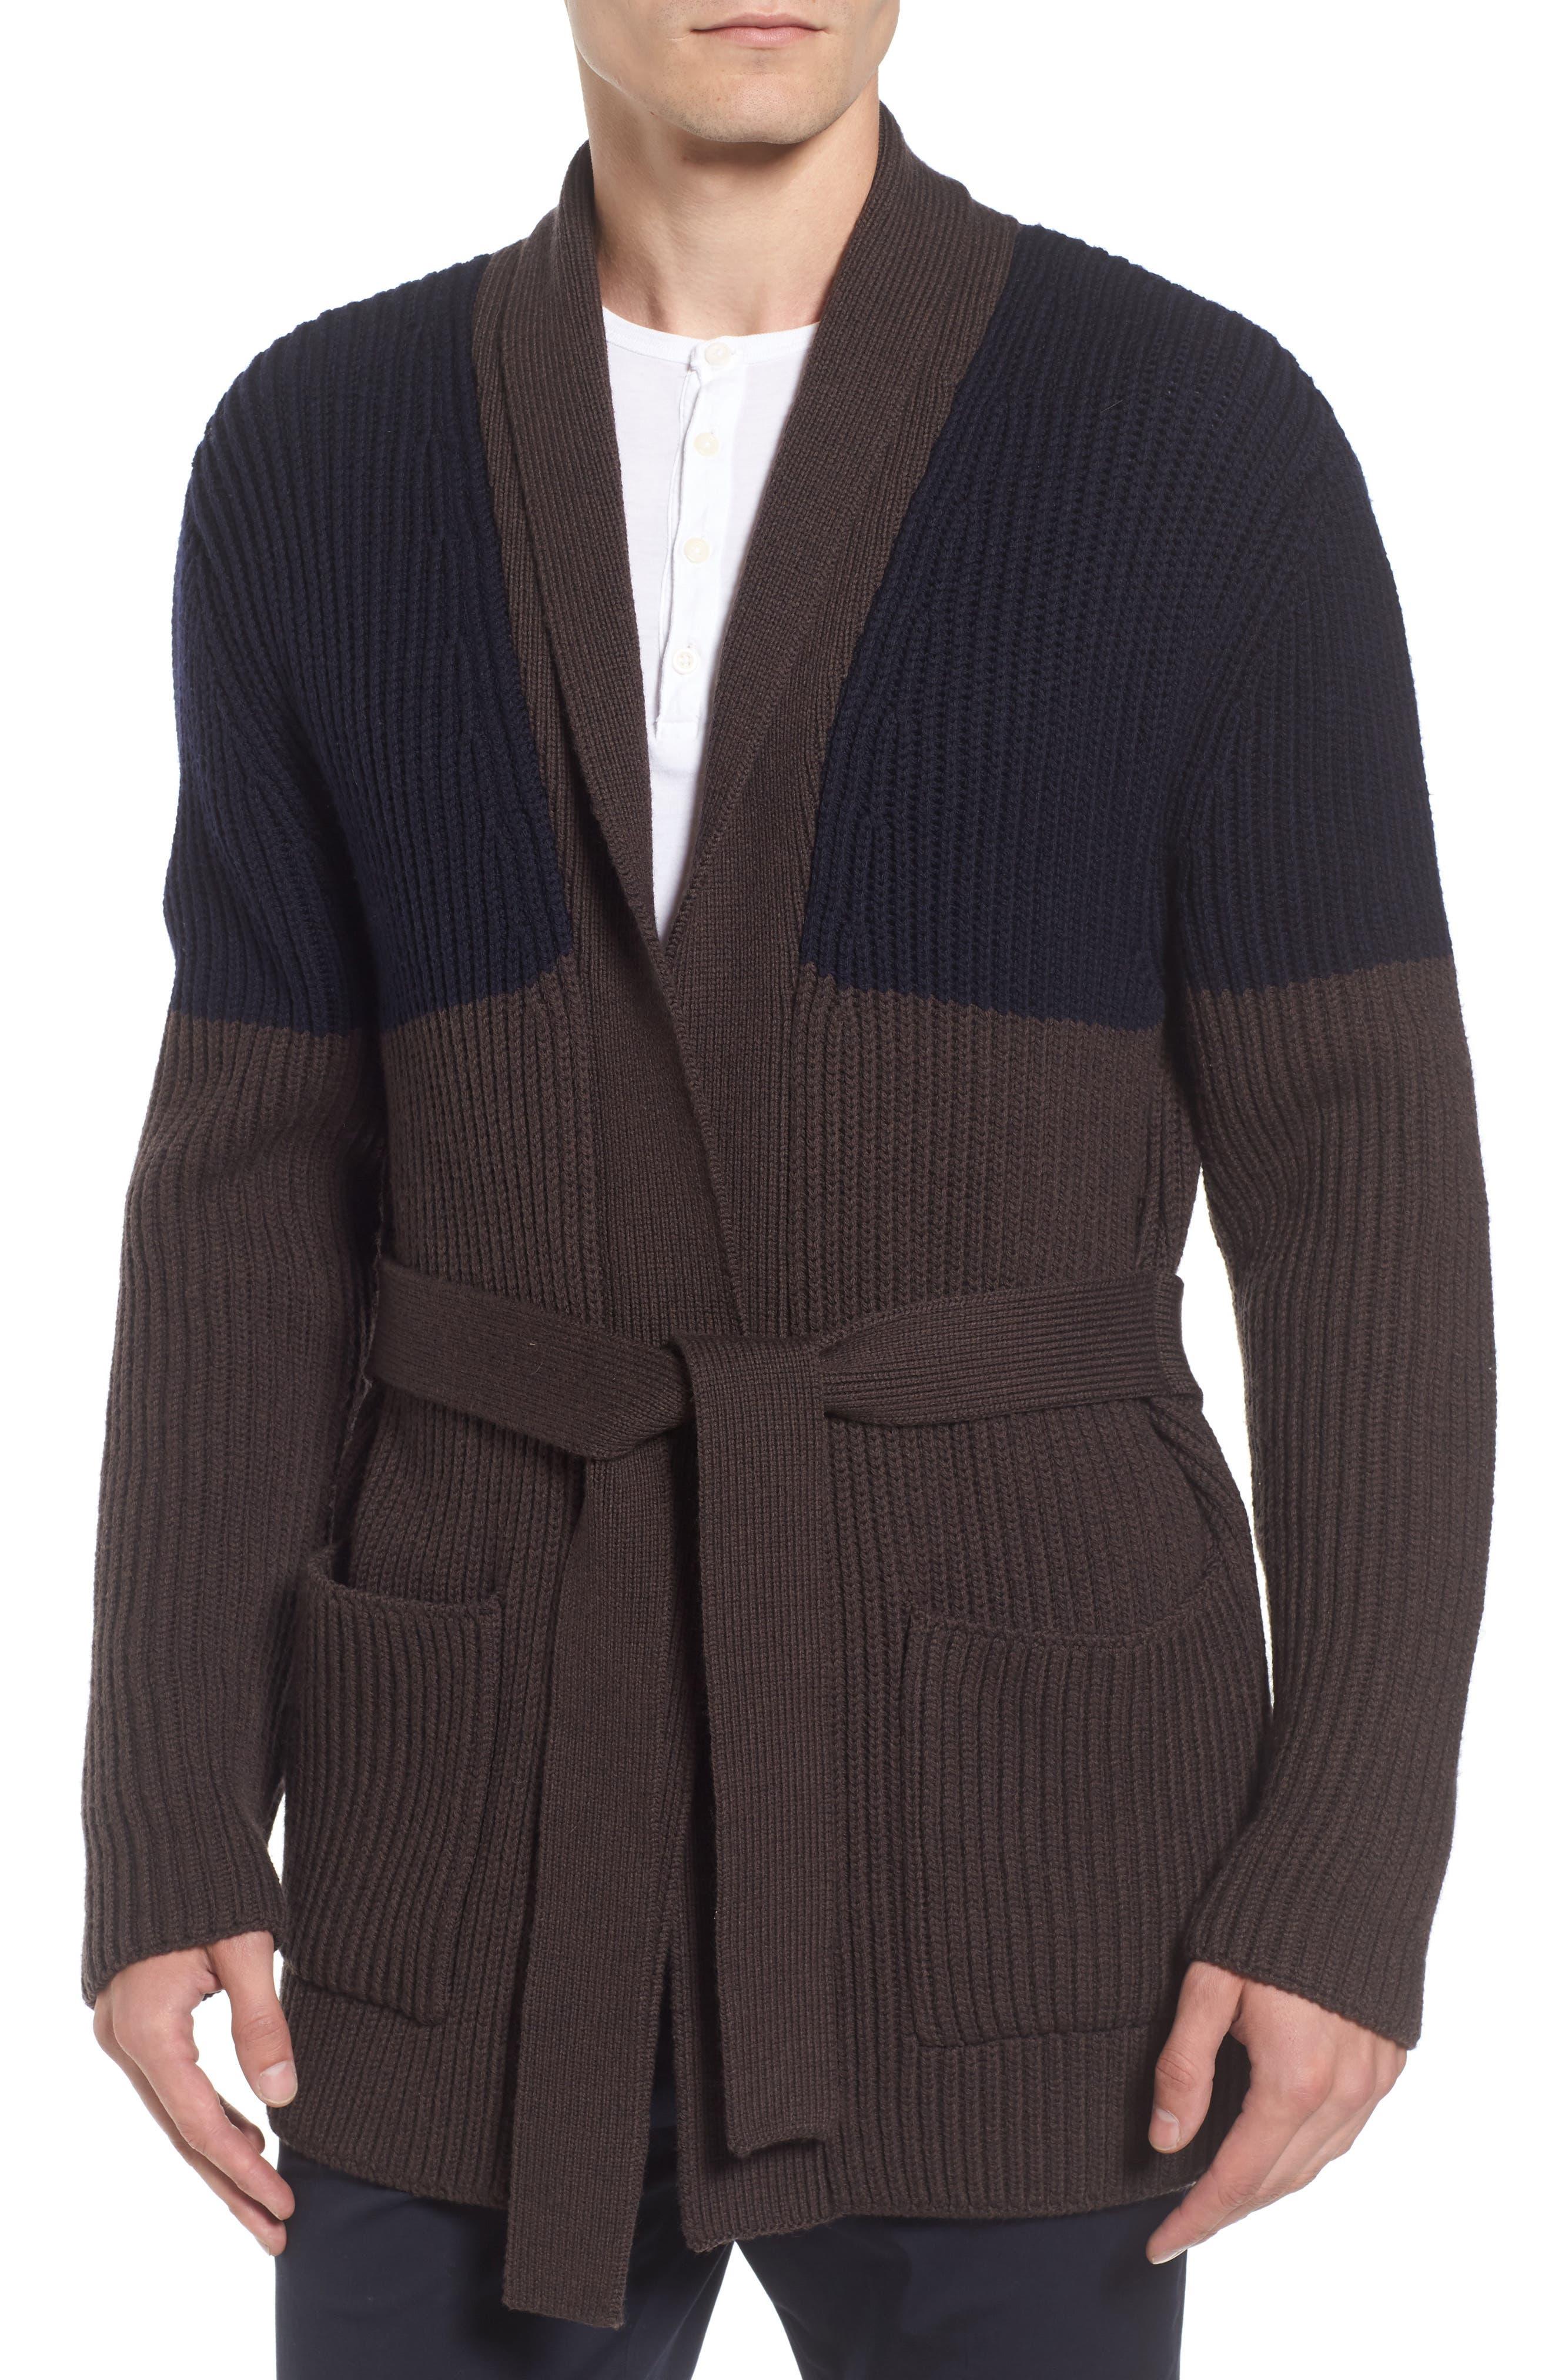 Alternate Image 1 Selected - Eleventy Colorblock Wool Wrap Sweater